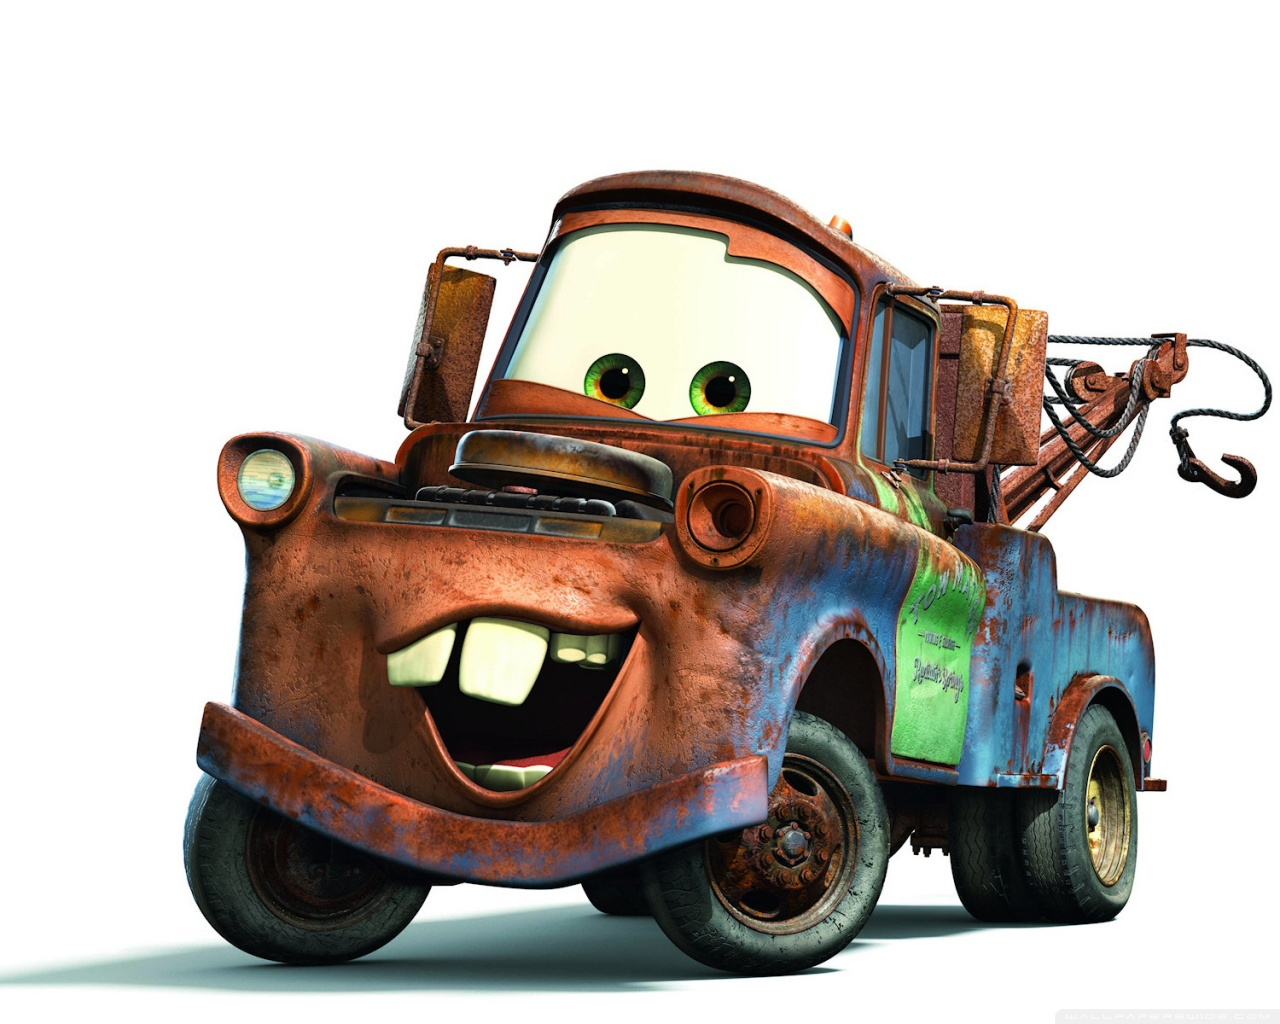 Tow Mater Cars Movie Wallpaper 1920x1200 Tow Mater Cars Movie 4k Hd Desktop Wallpaper For 4k Ultra